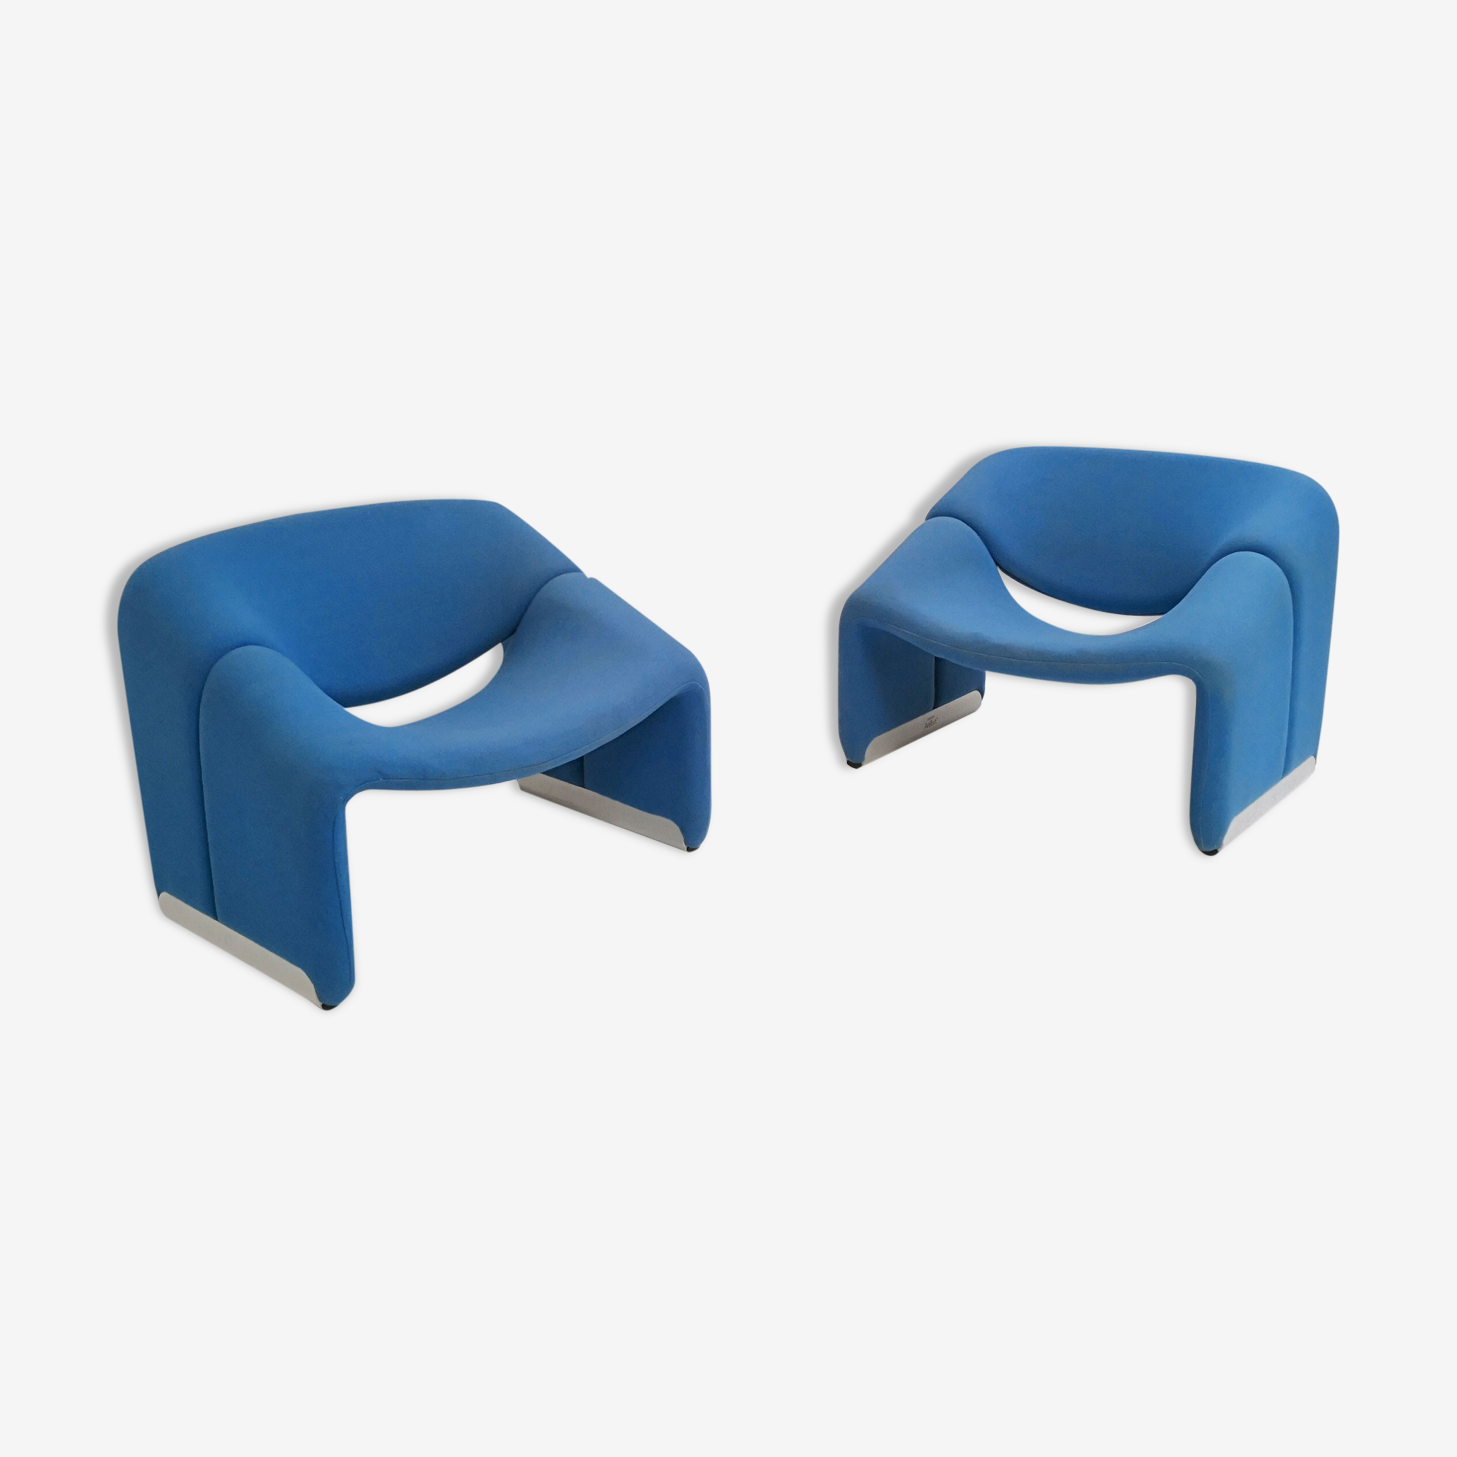 Pair of armchairs F598' Groovy ', Pierre Paulin for Artifort